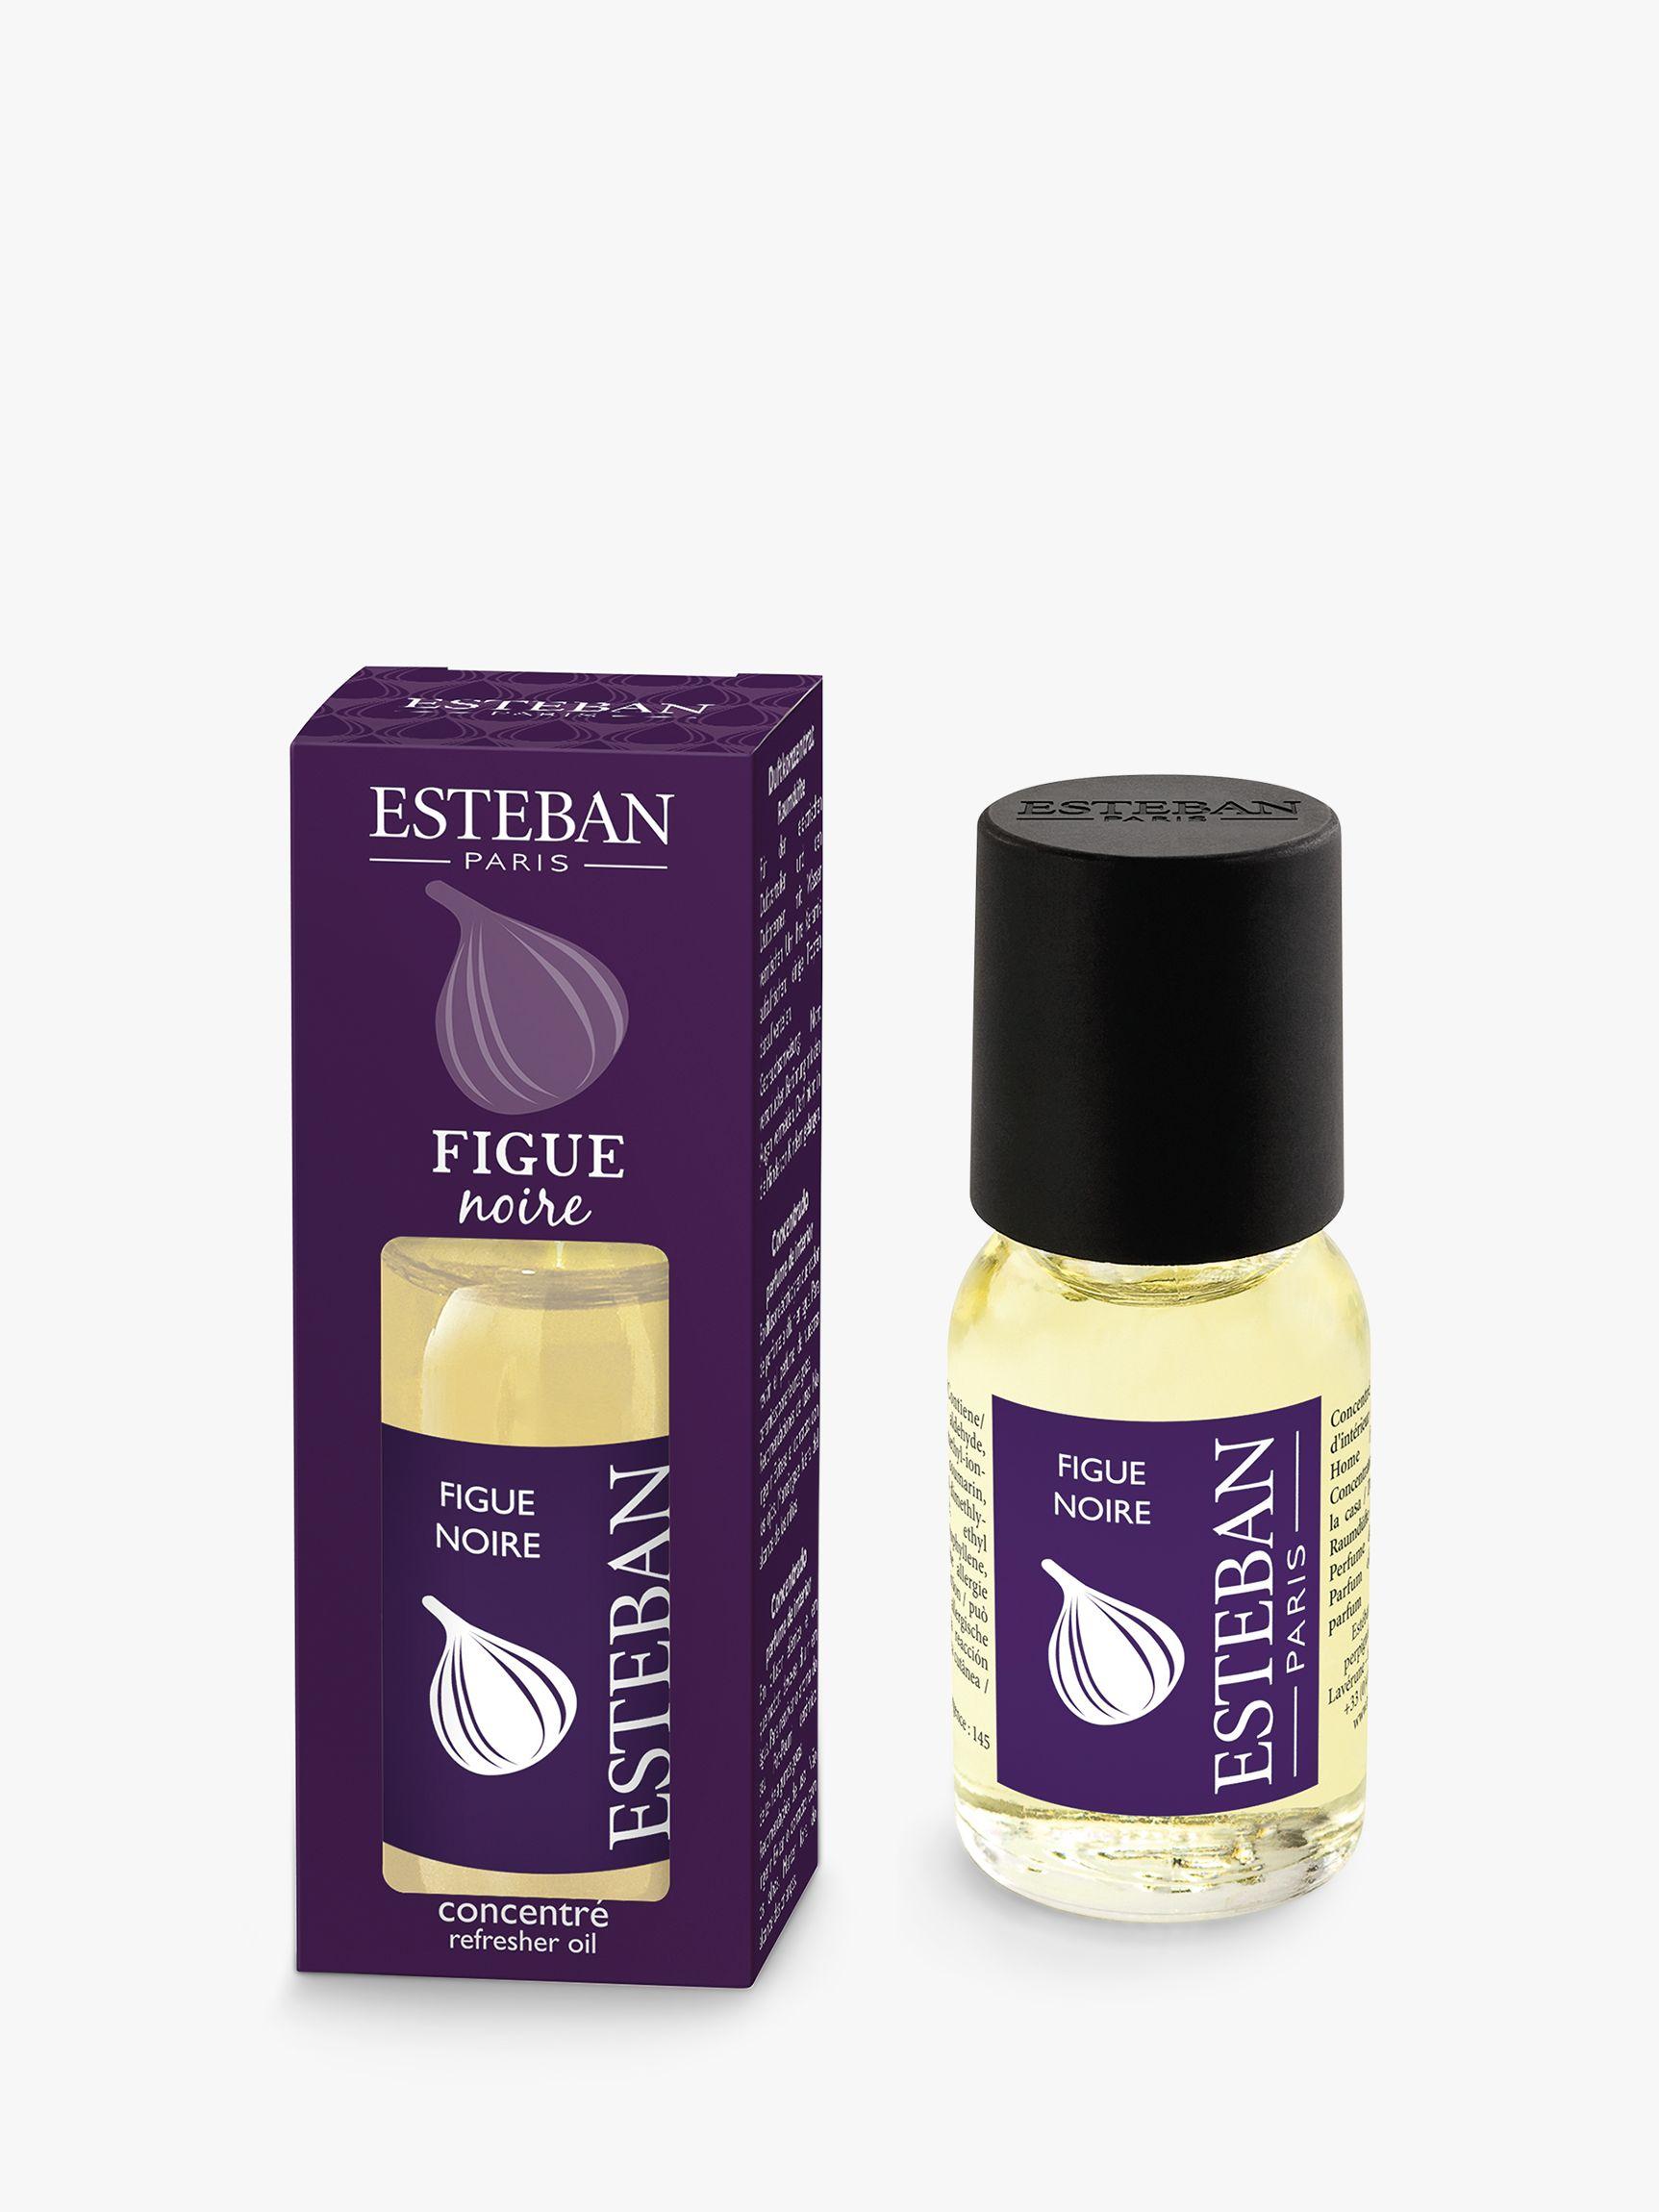 Esteban Esteban Figue Refresher Oil, 15ml